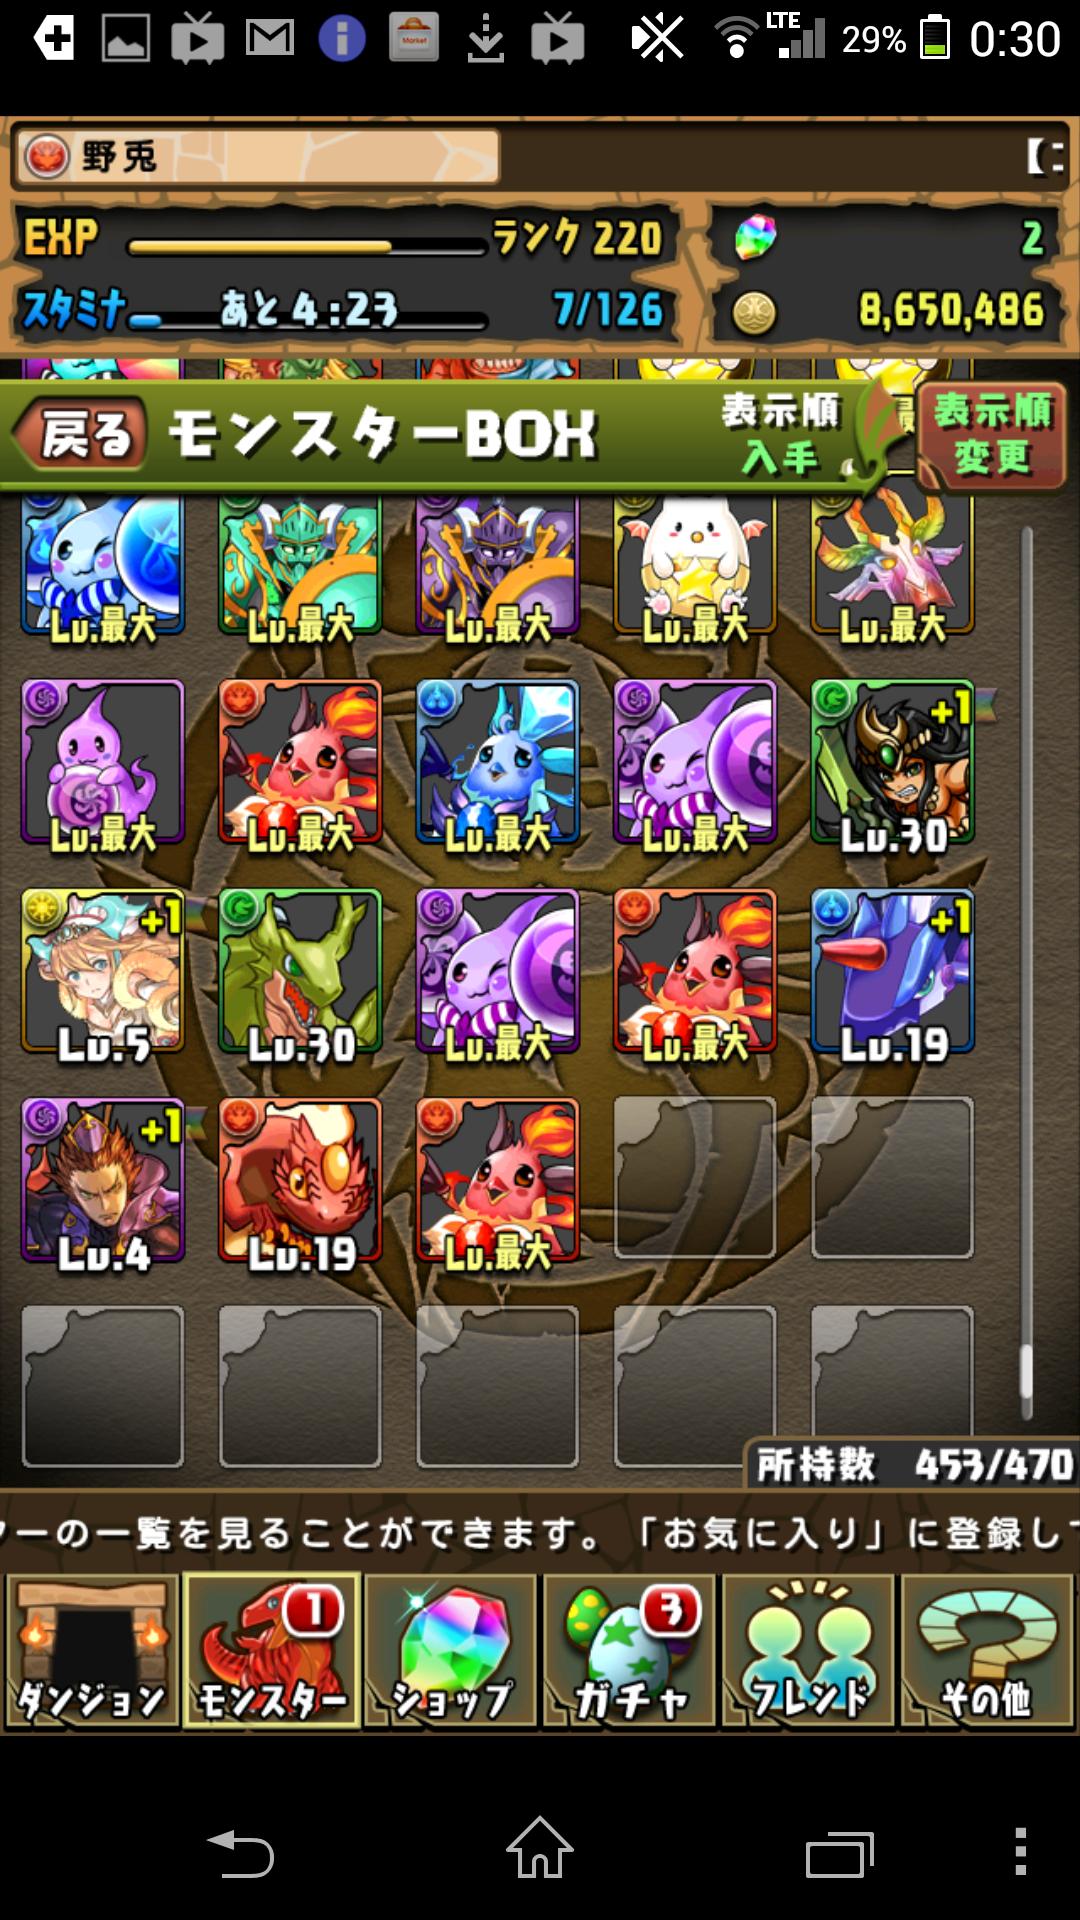 Screenshot_2014-04-01-00-30-51.png